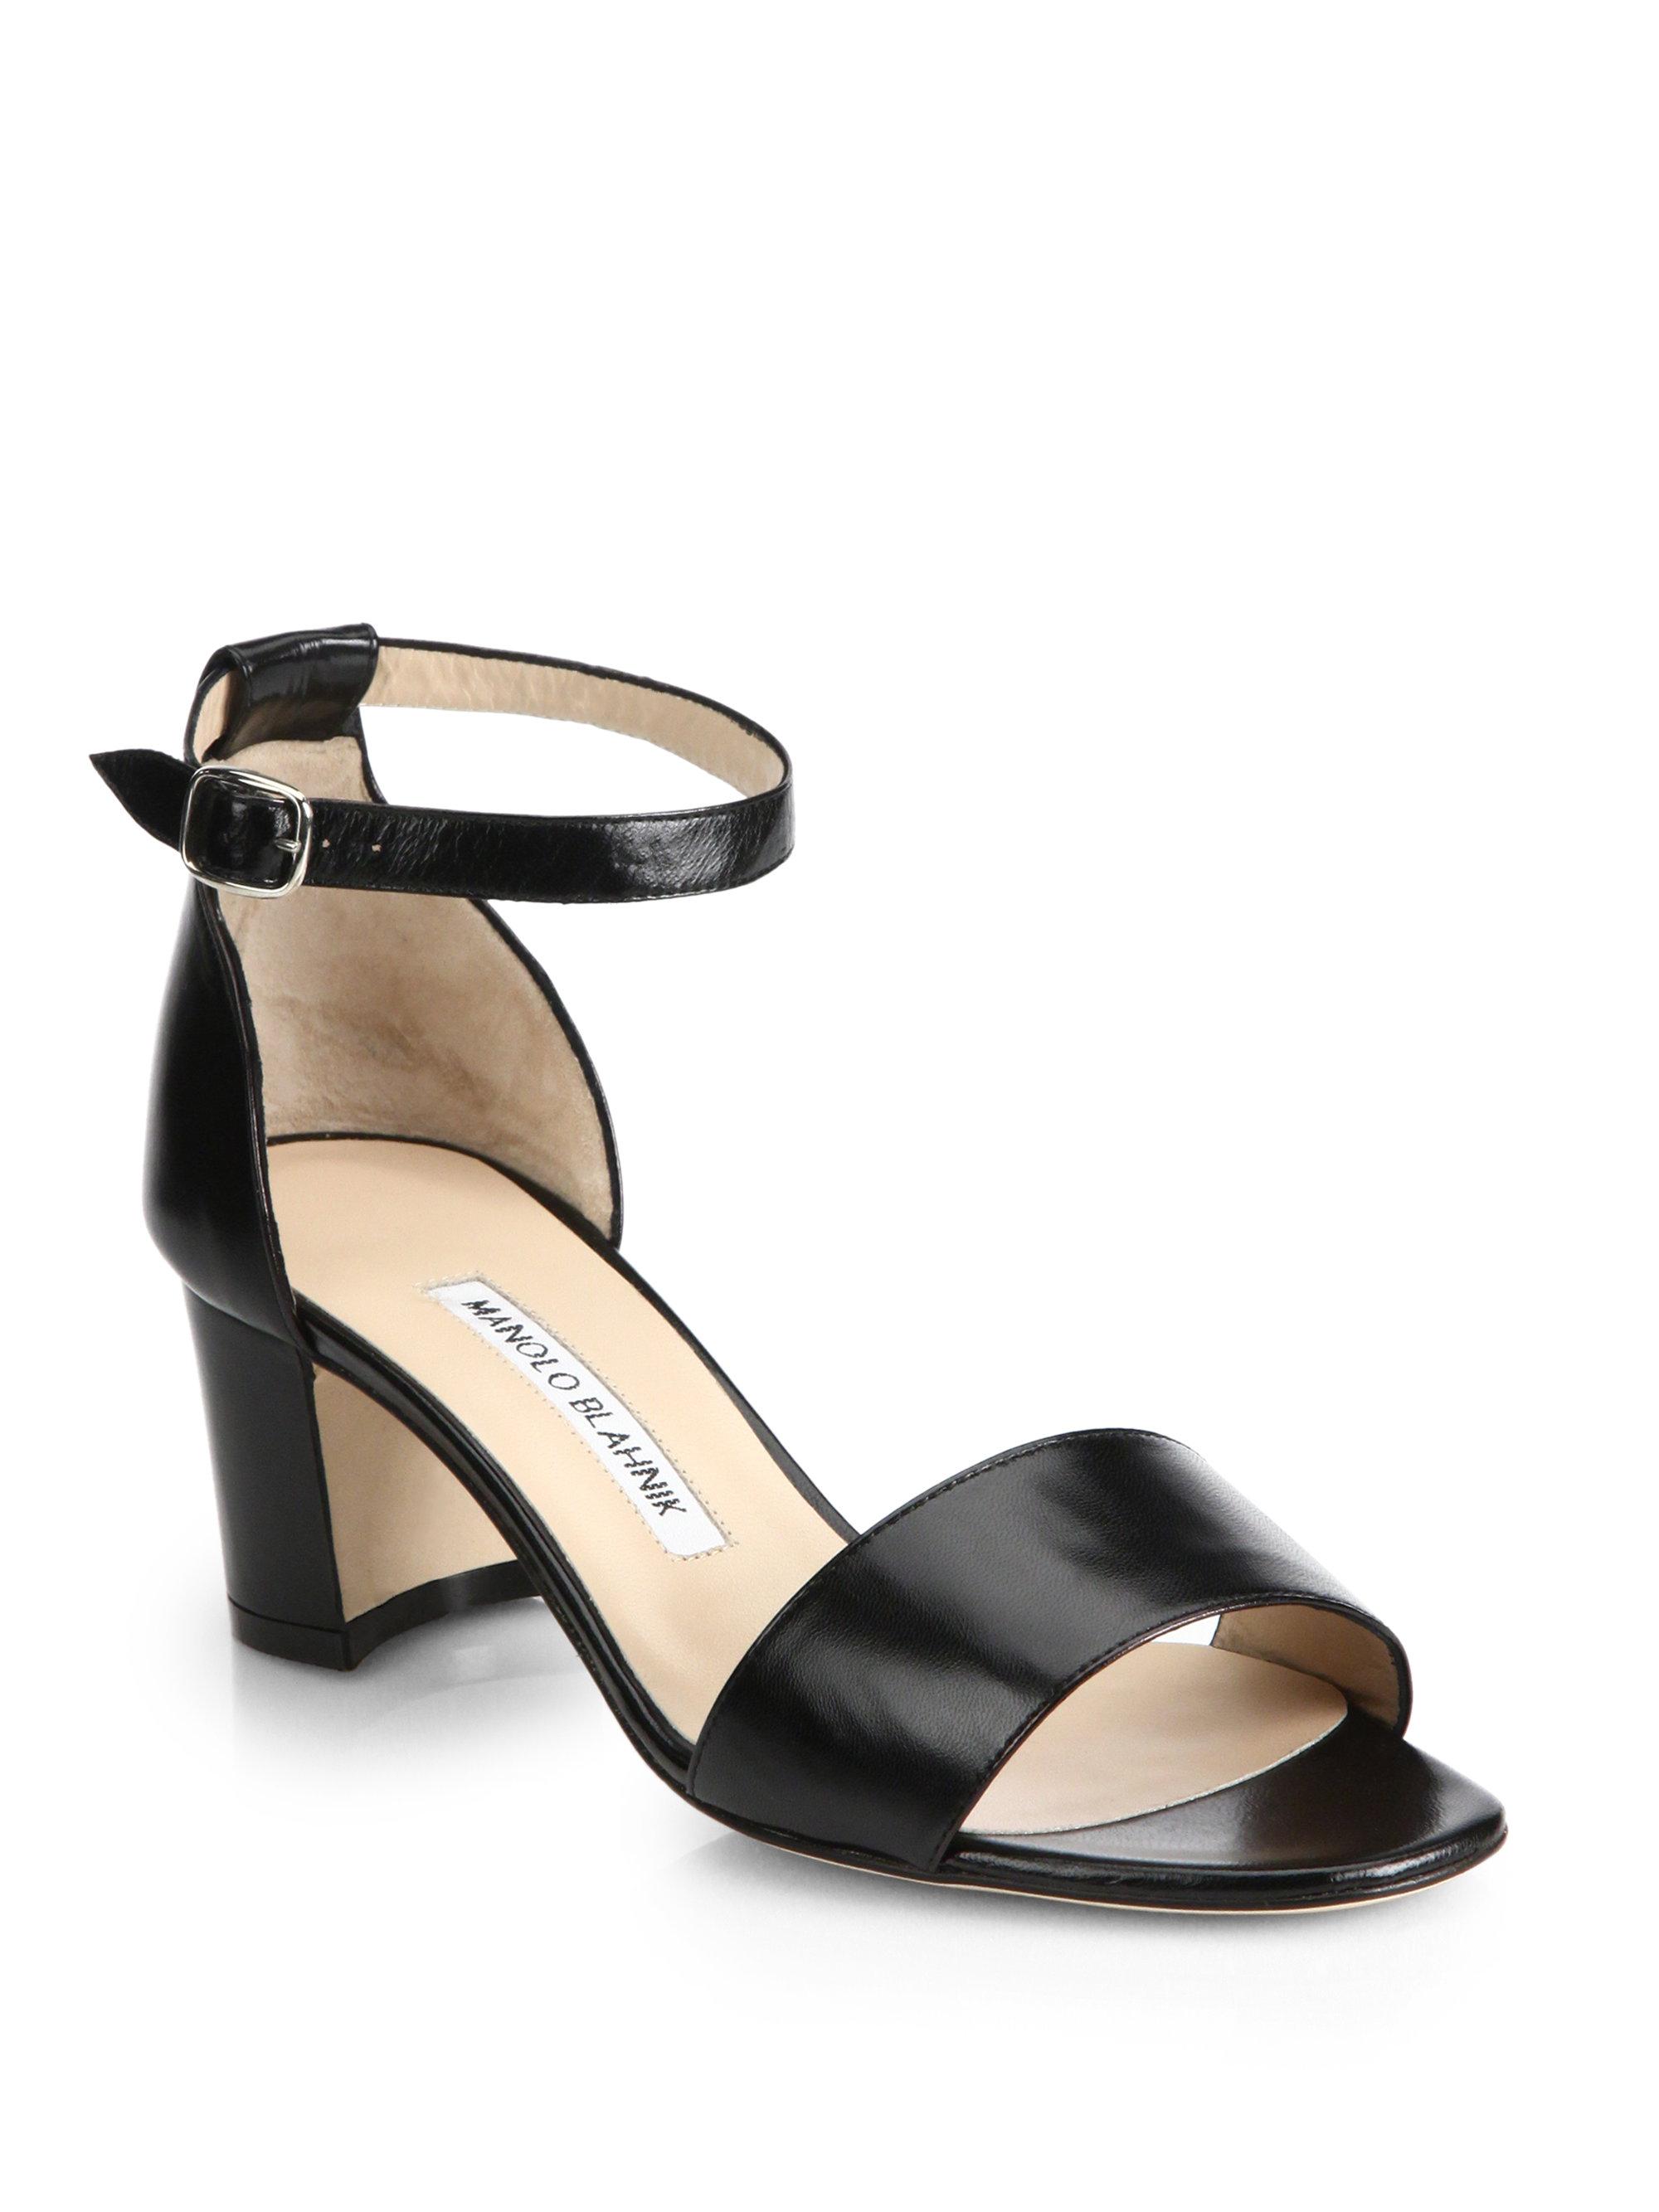 Gucci Mens Sandals On Sale Images Design Decorating Ideas